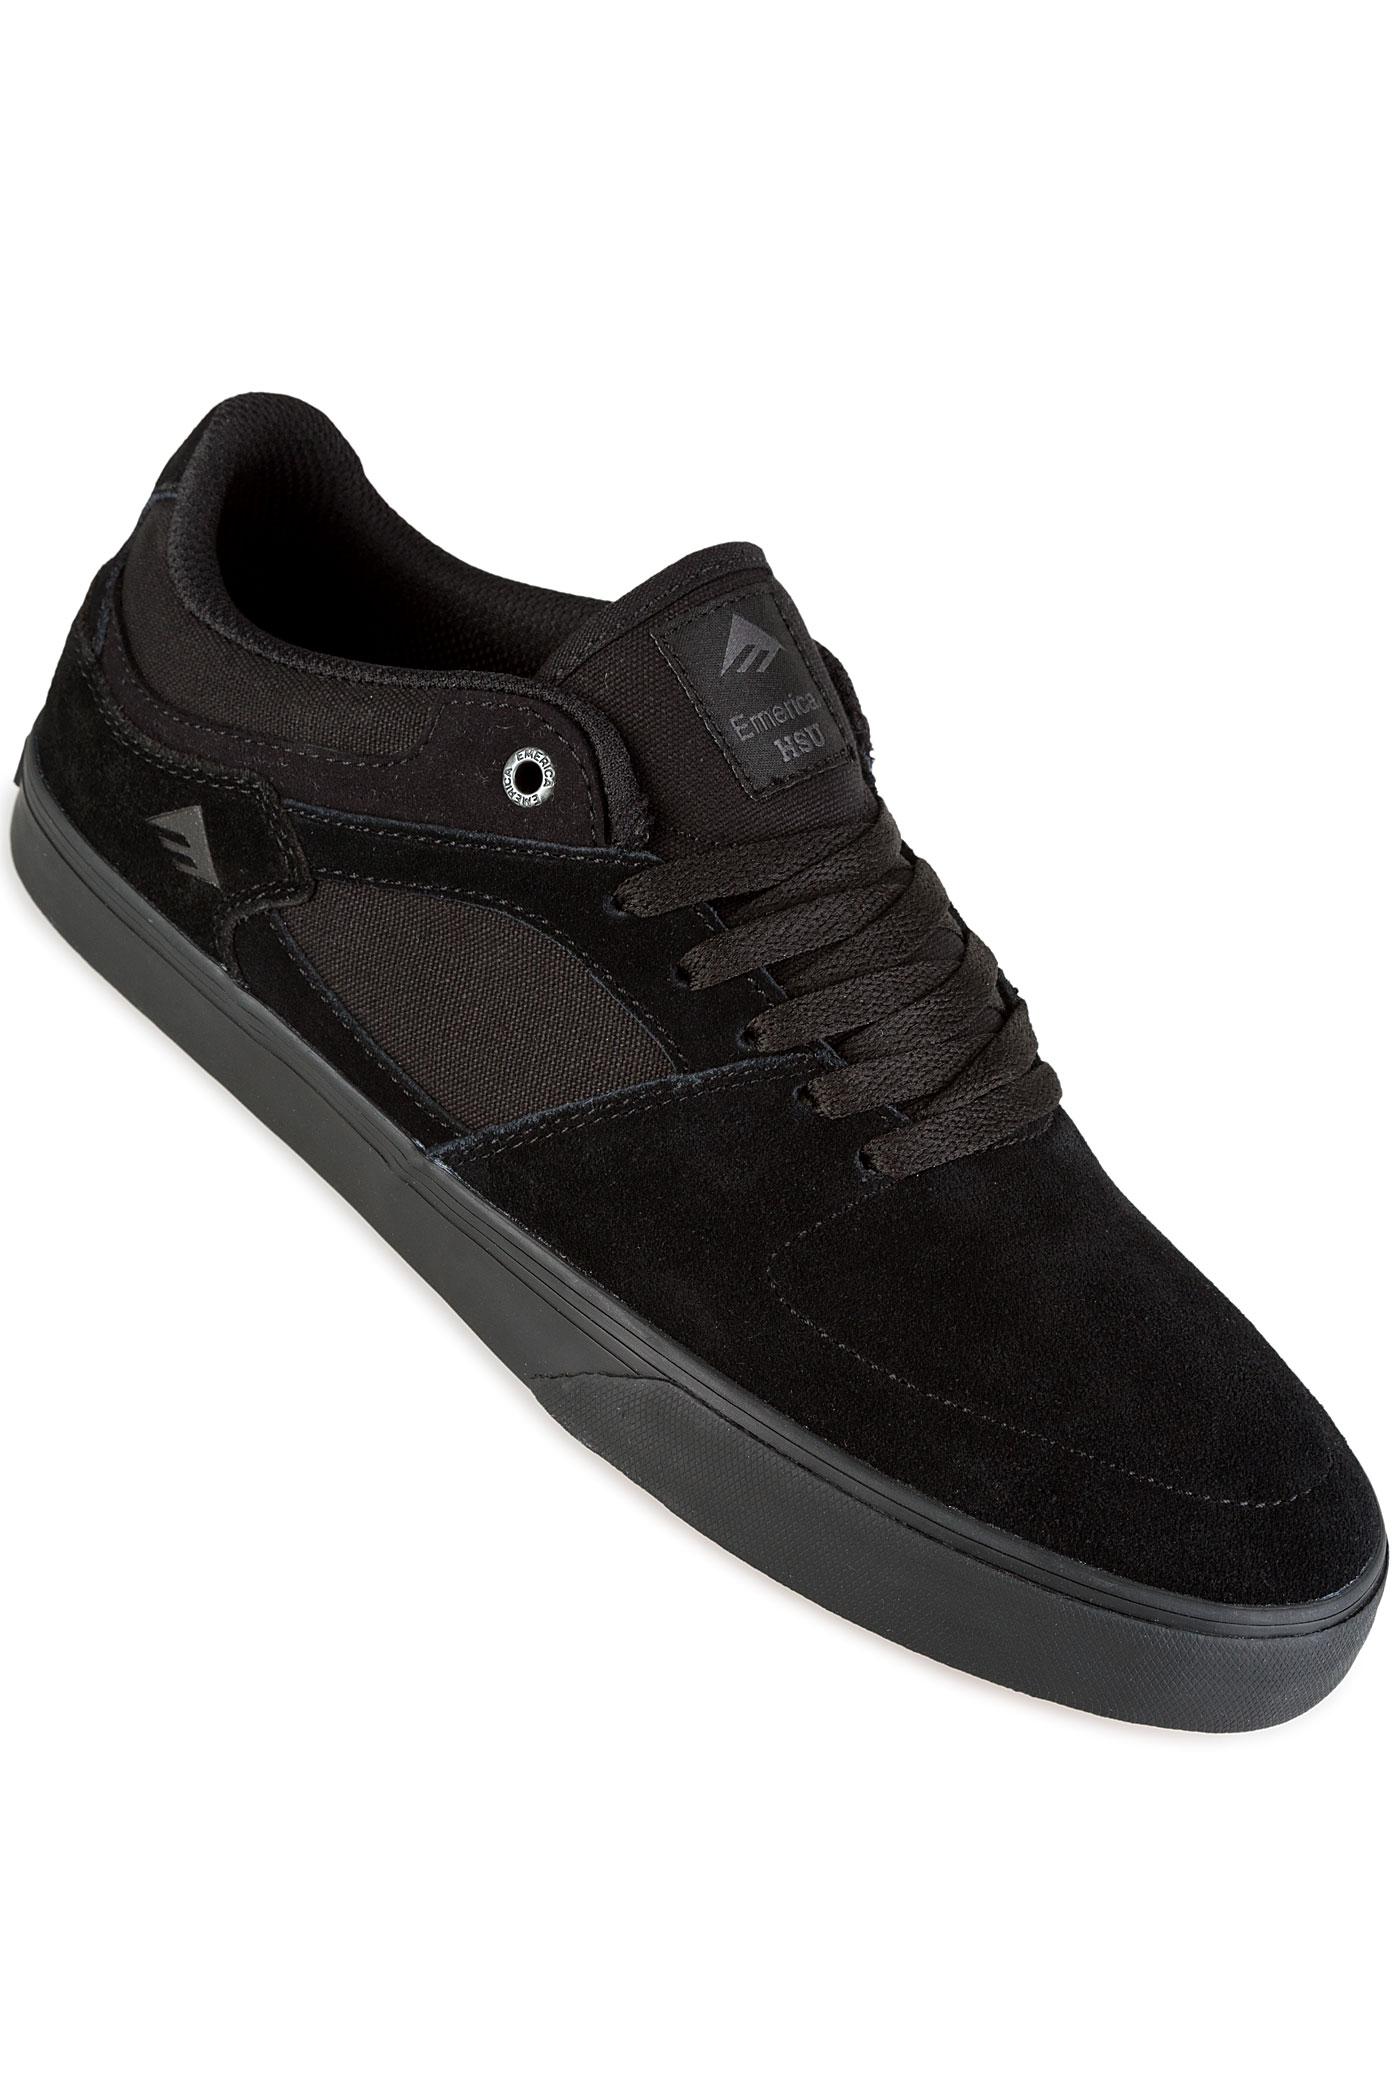 Emerica Vulc The Low Hsu Chaussureblack Black m08nwvN